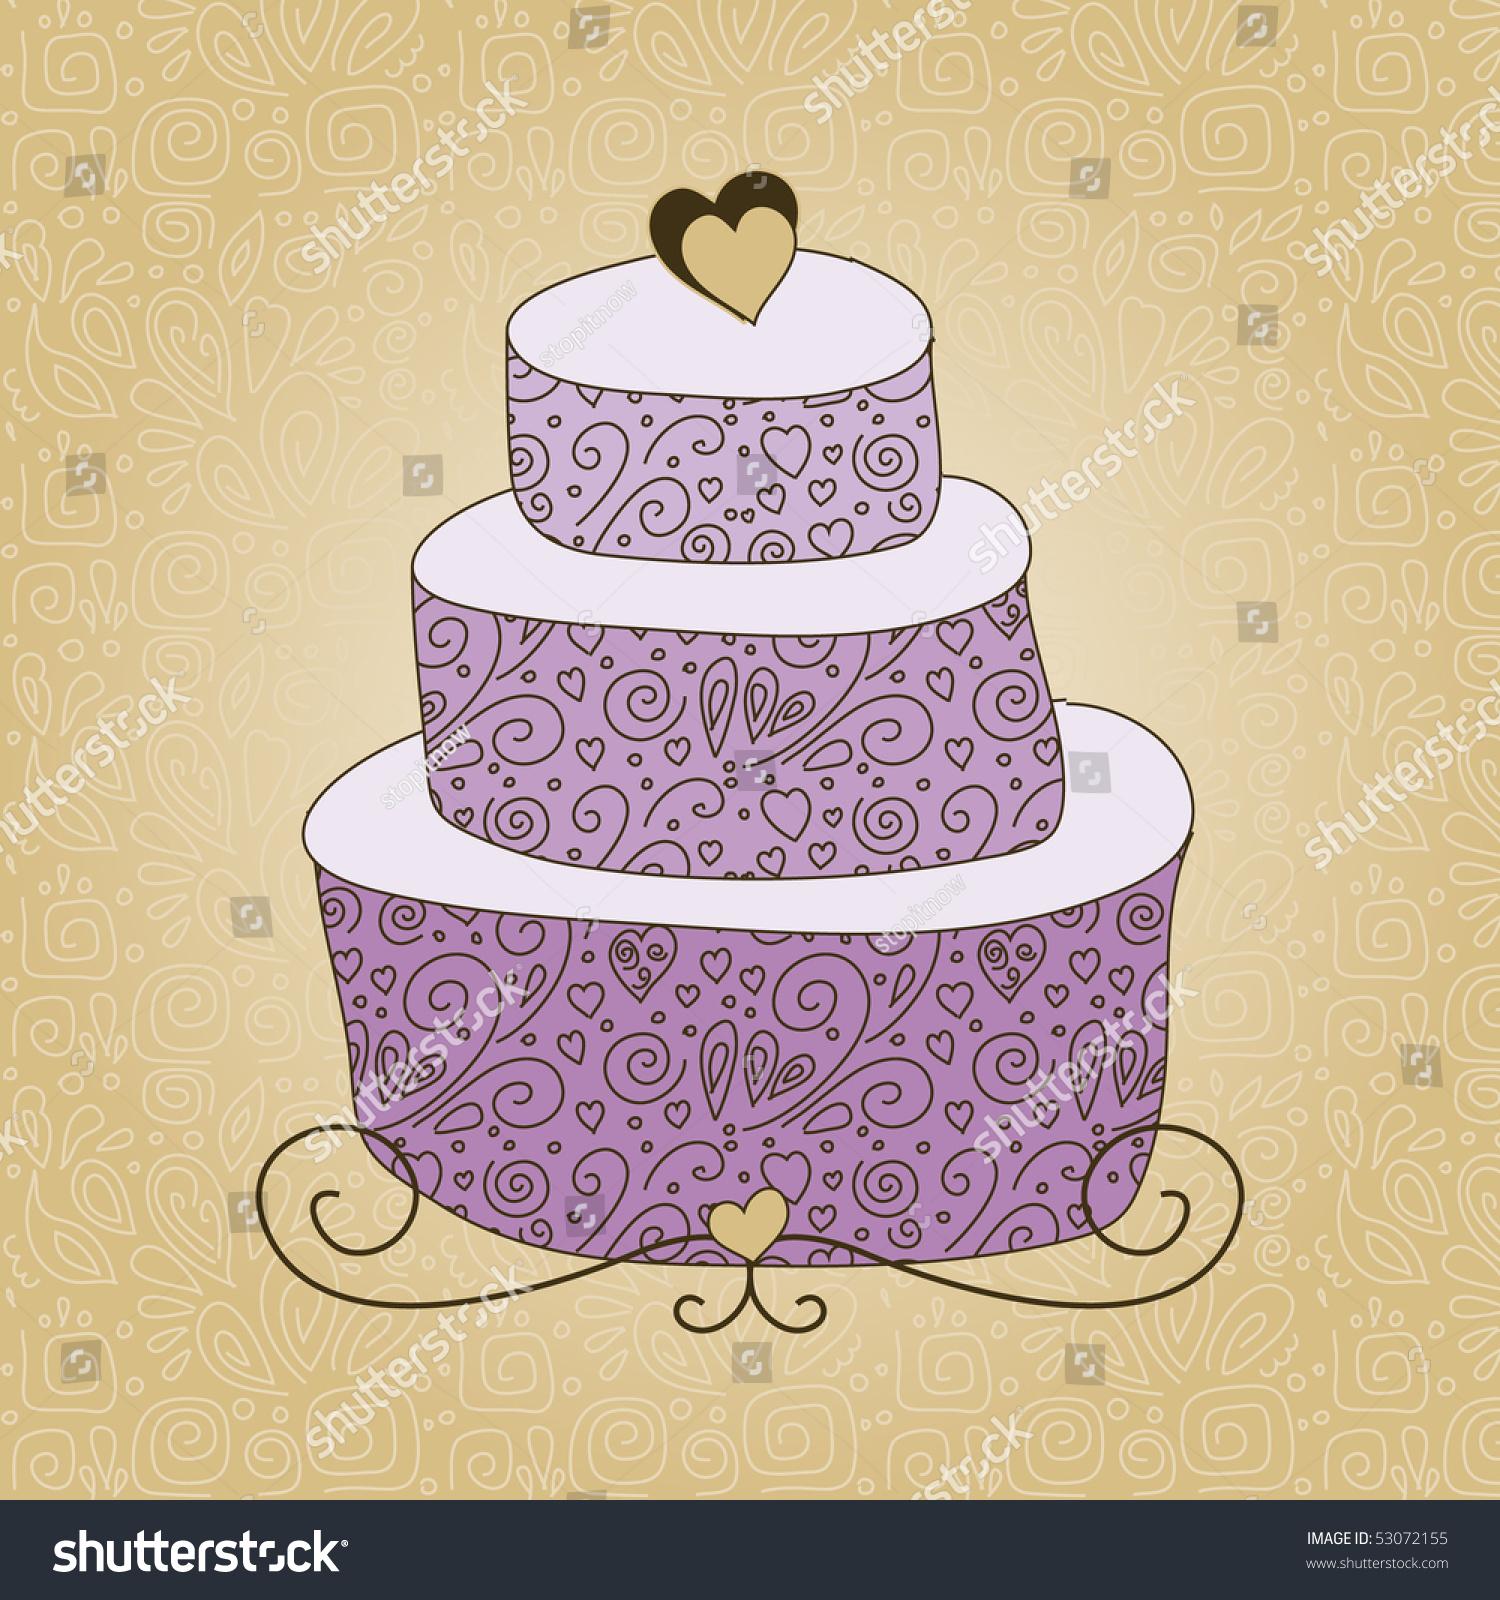 Big Violet Cake Stock Vector (Royalty Free) 53072155 - Shutterstock